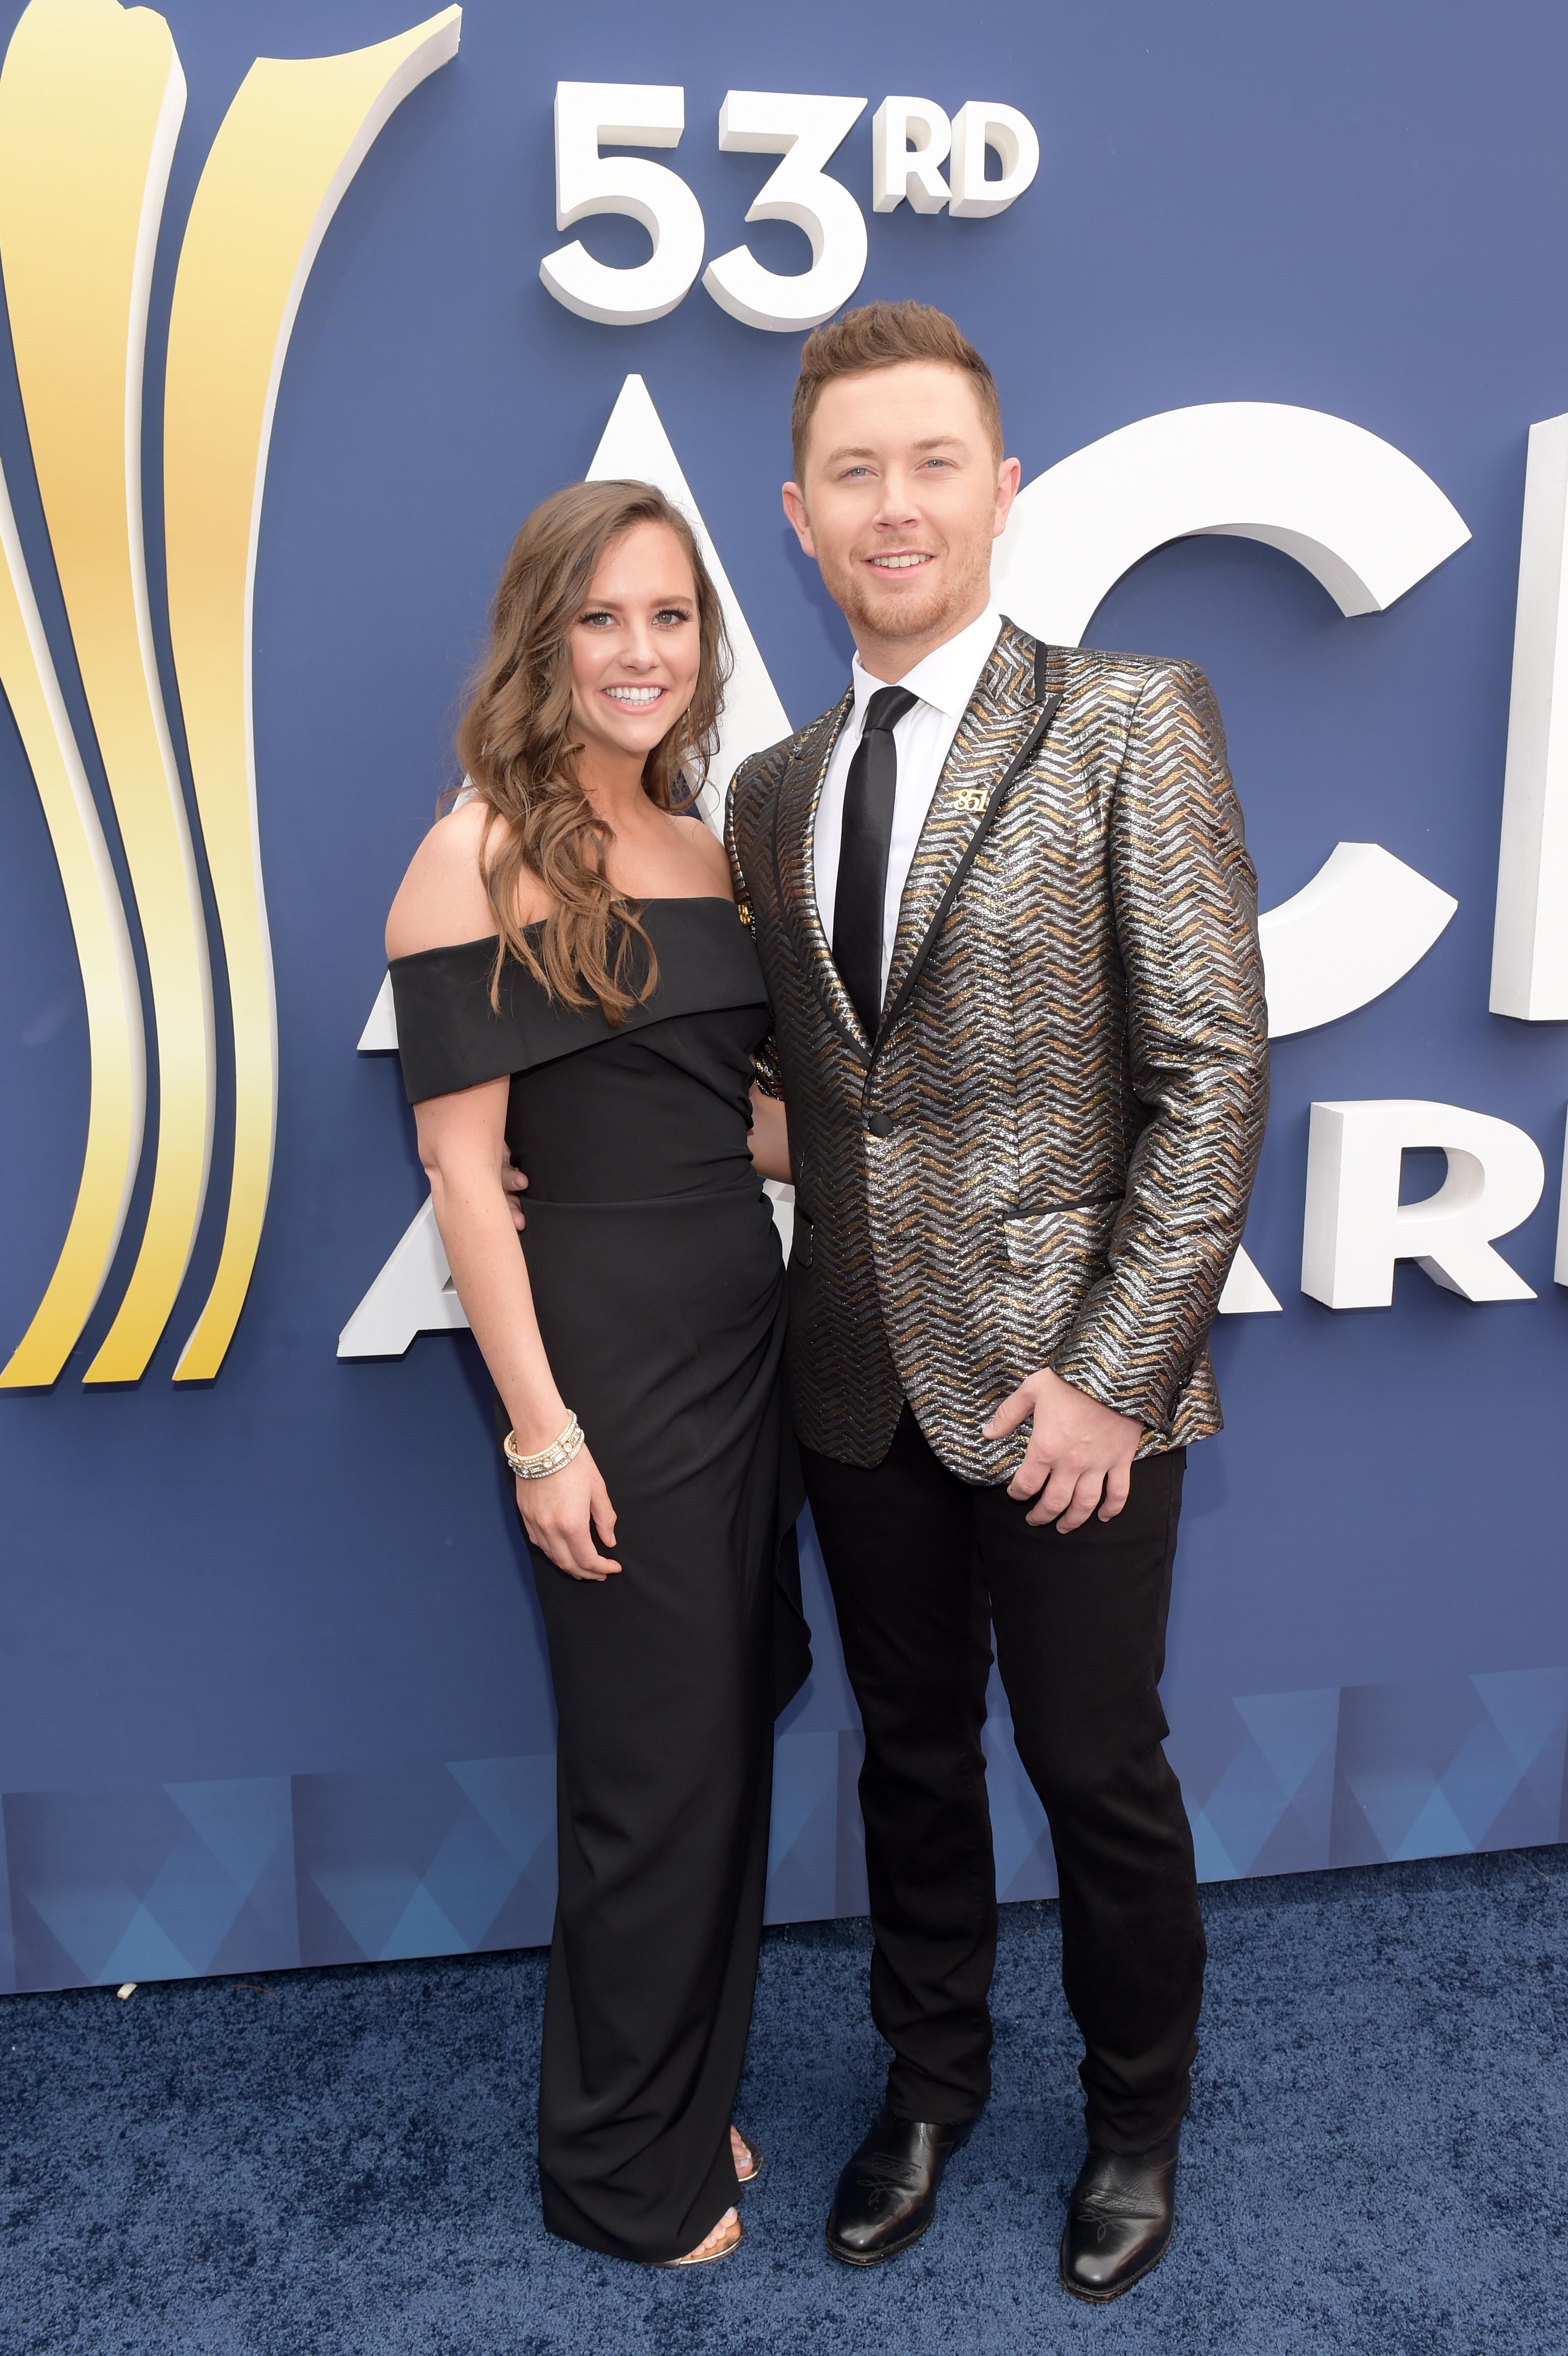 Scotty-McCreery-Brings-His-Fiancee-Gabi-Dugal-To-The-2018-ACM-Awards